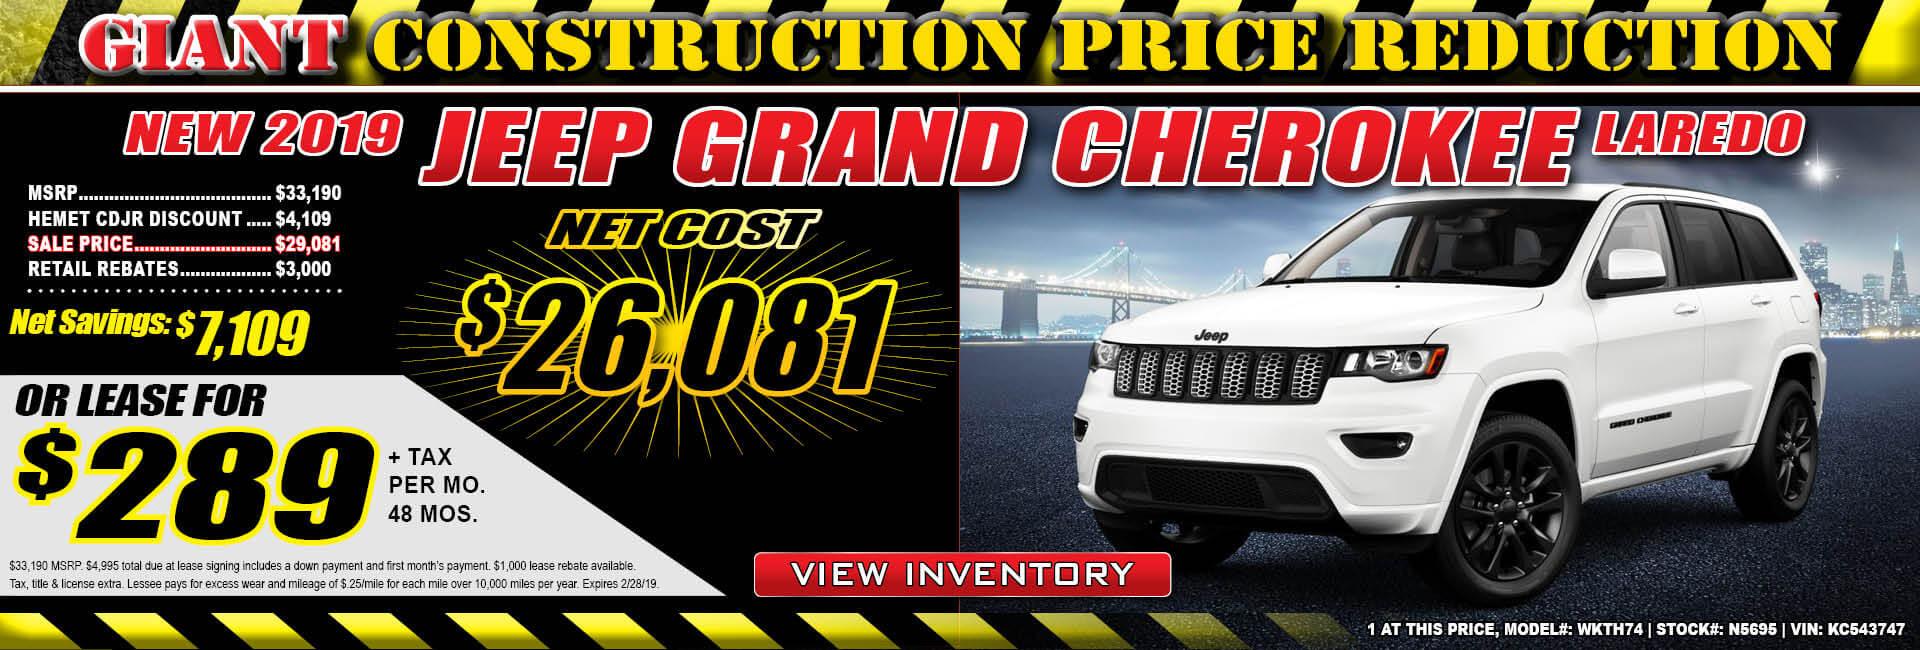 Jeep Grand Cherokee $289 Lease